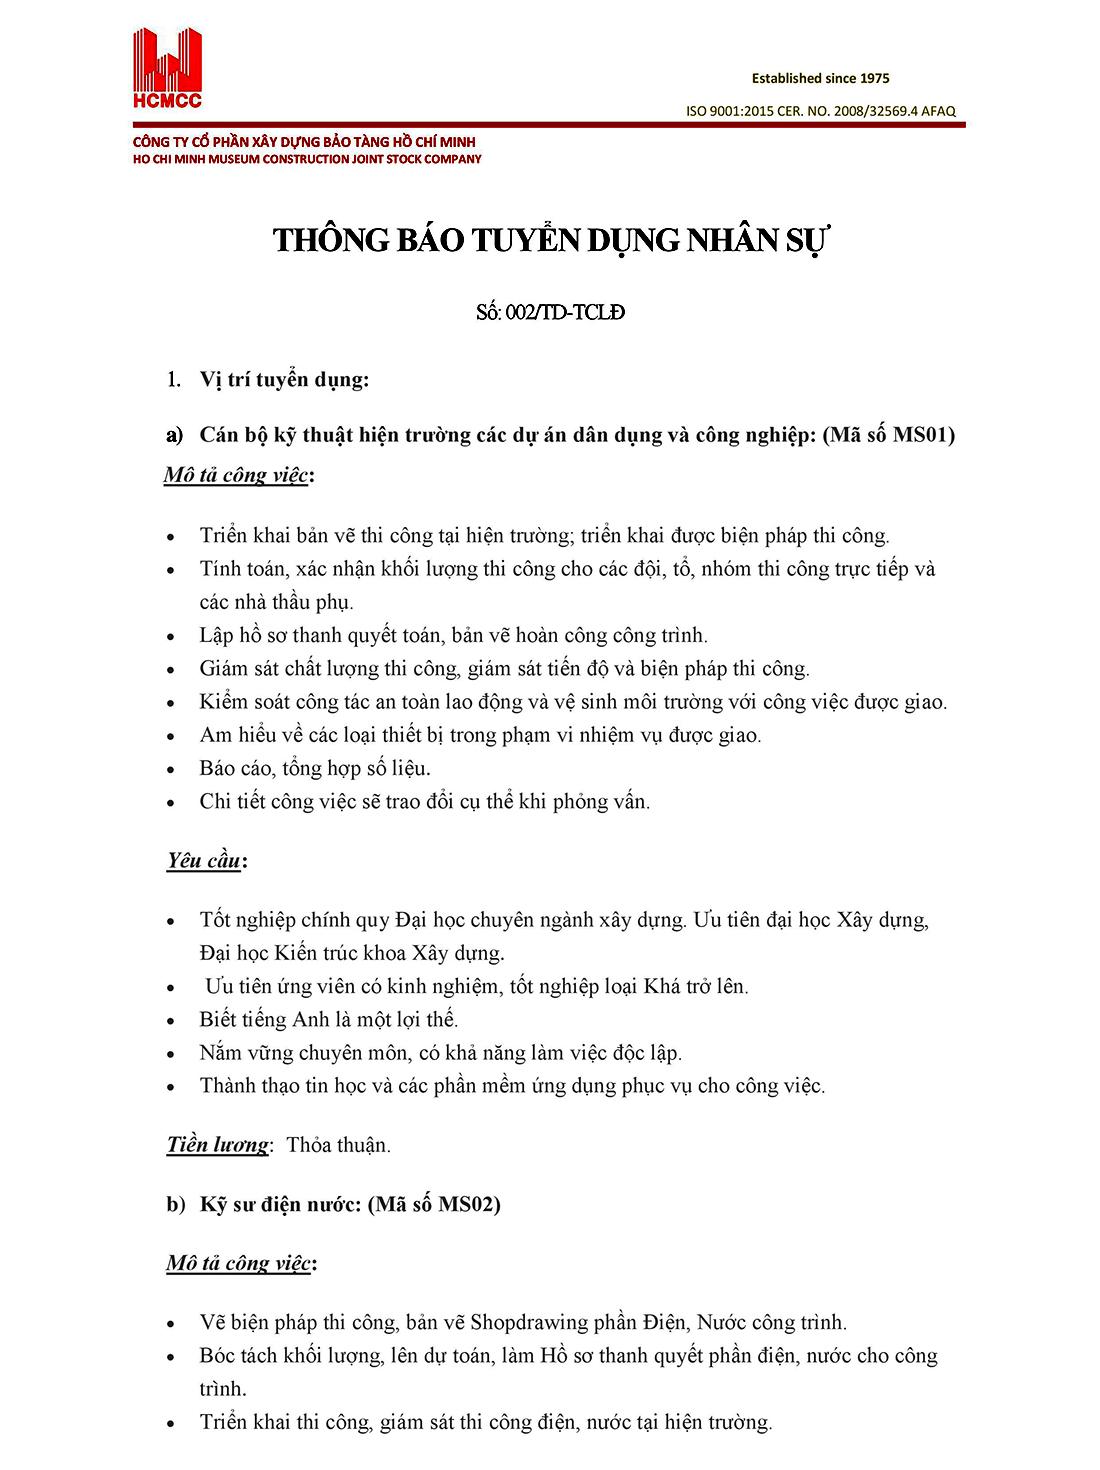 Tuyen_dung_T3_2019 (1)